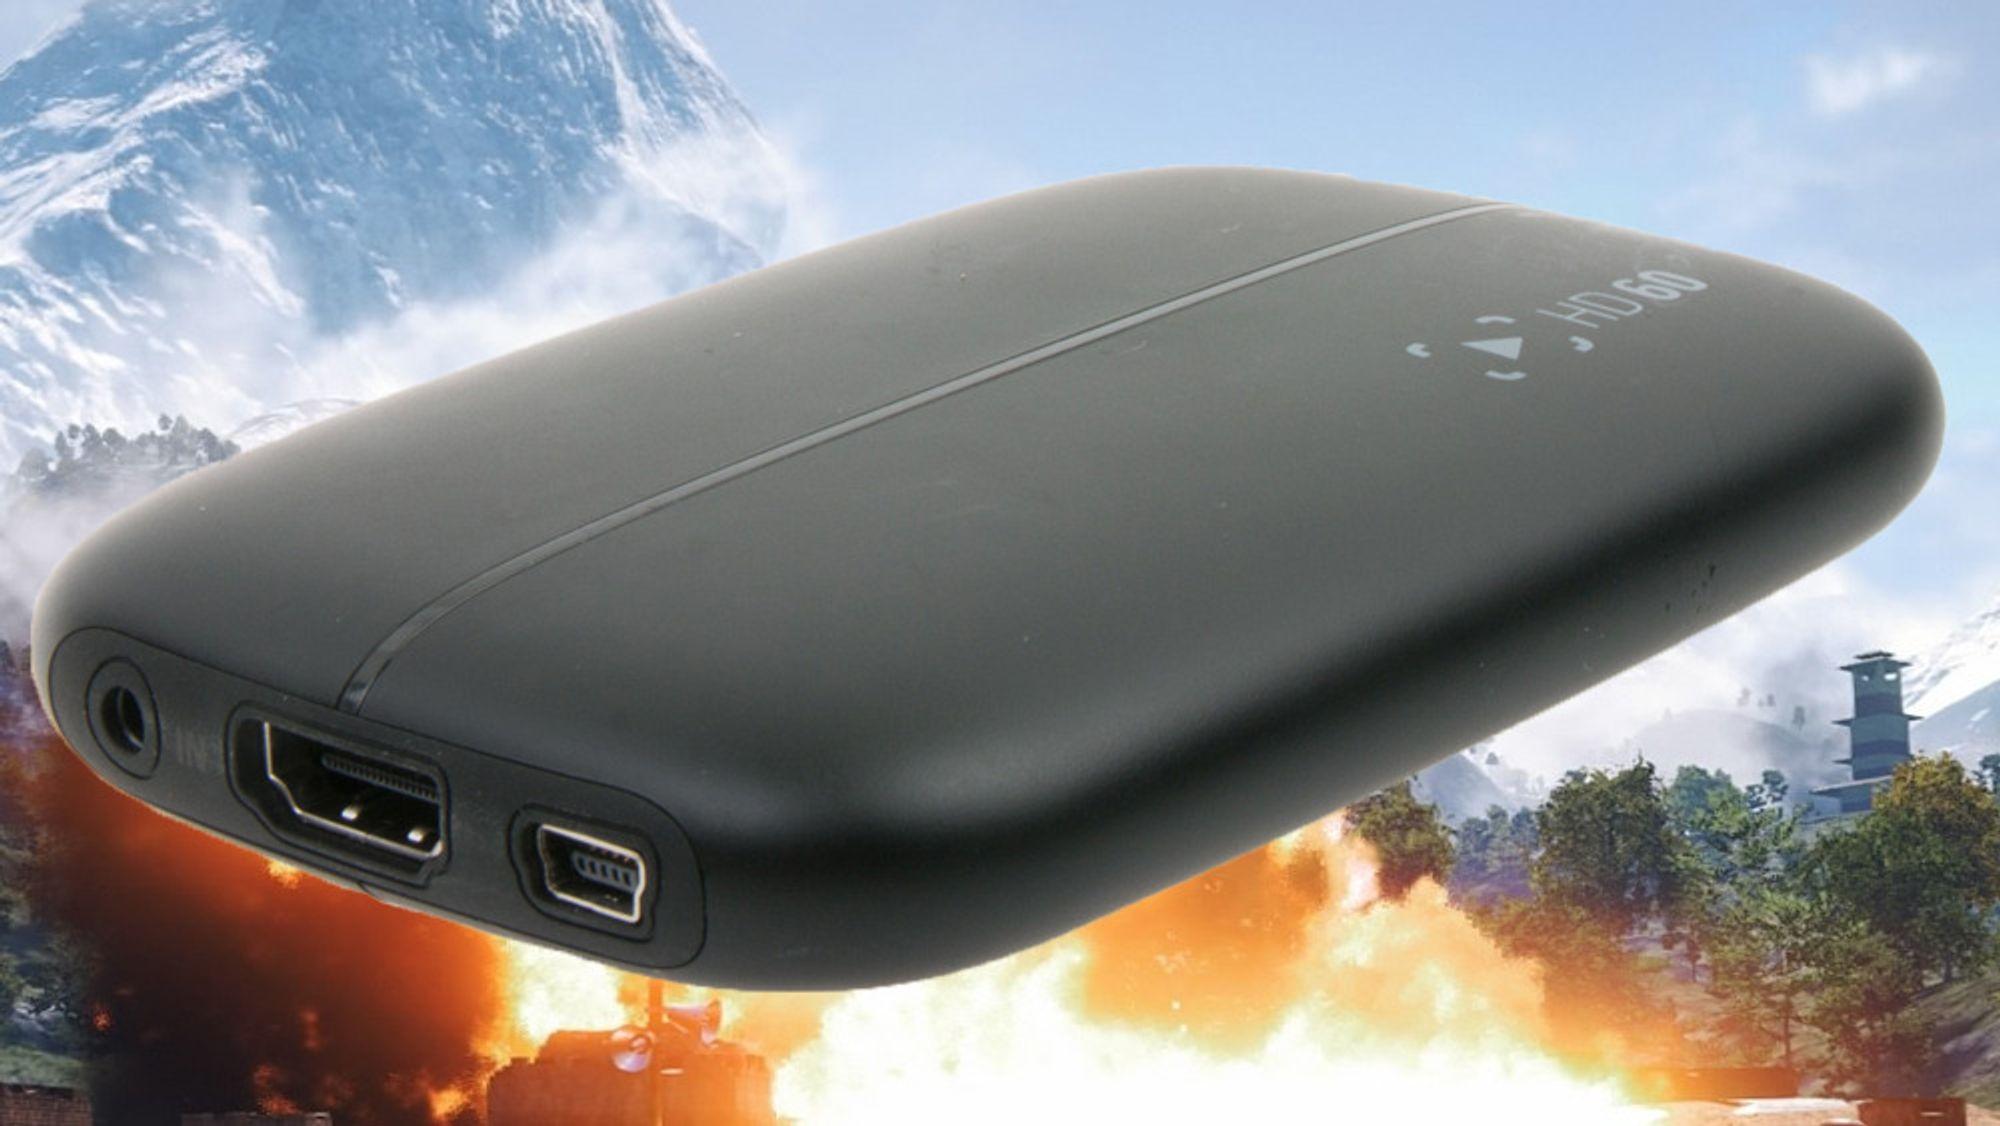 ANMELDELSE: Elgato Game Capture HD60